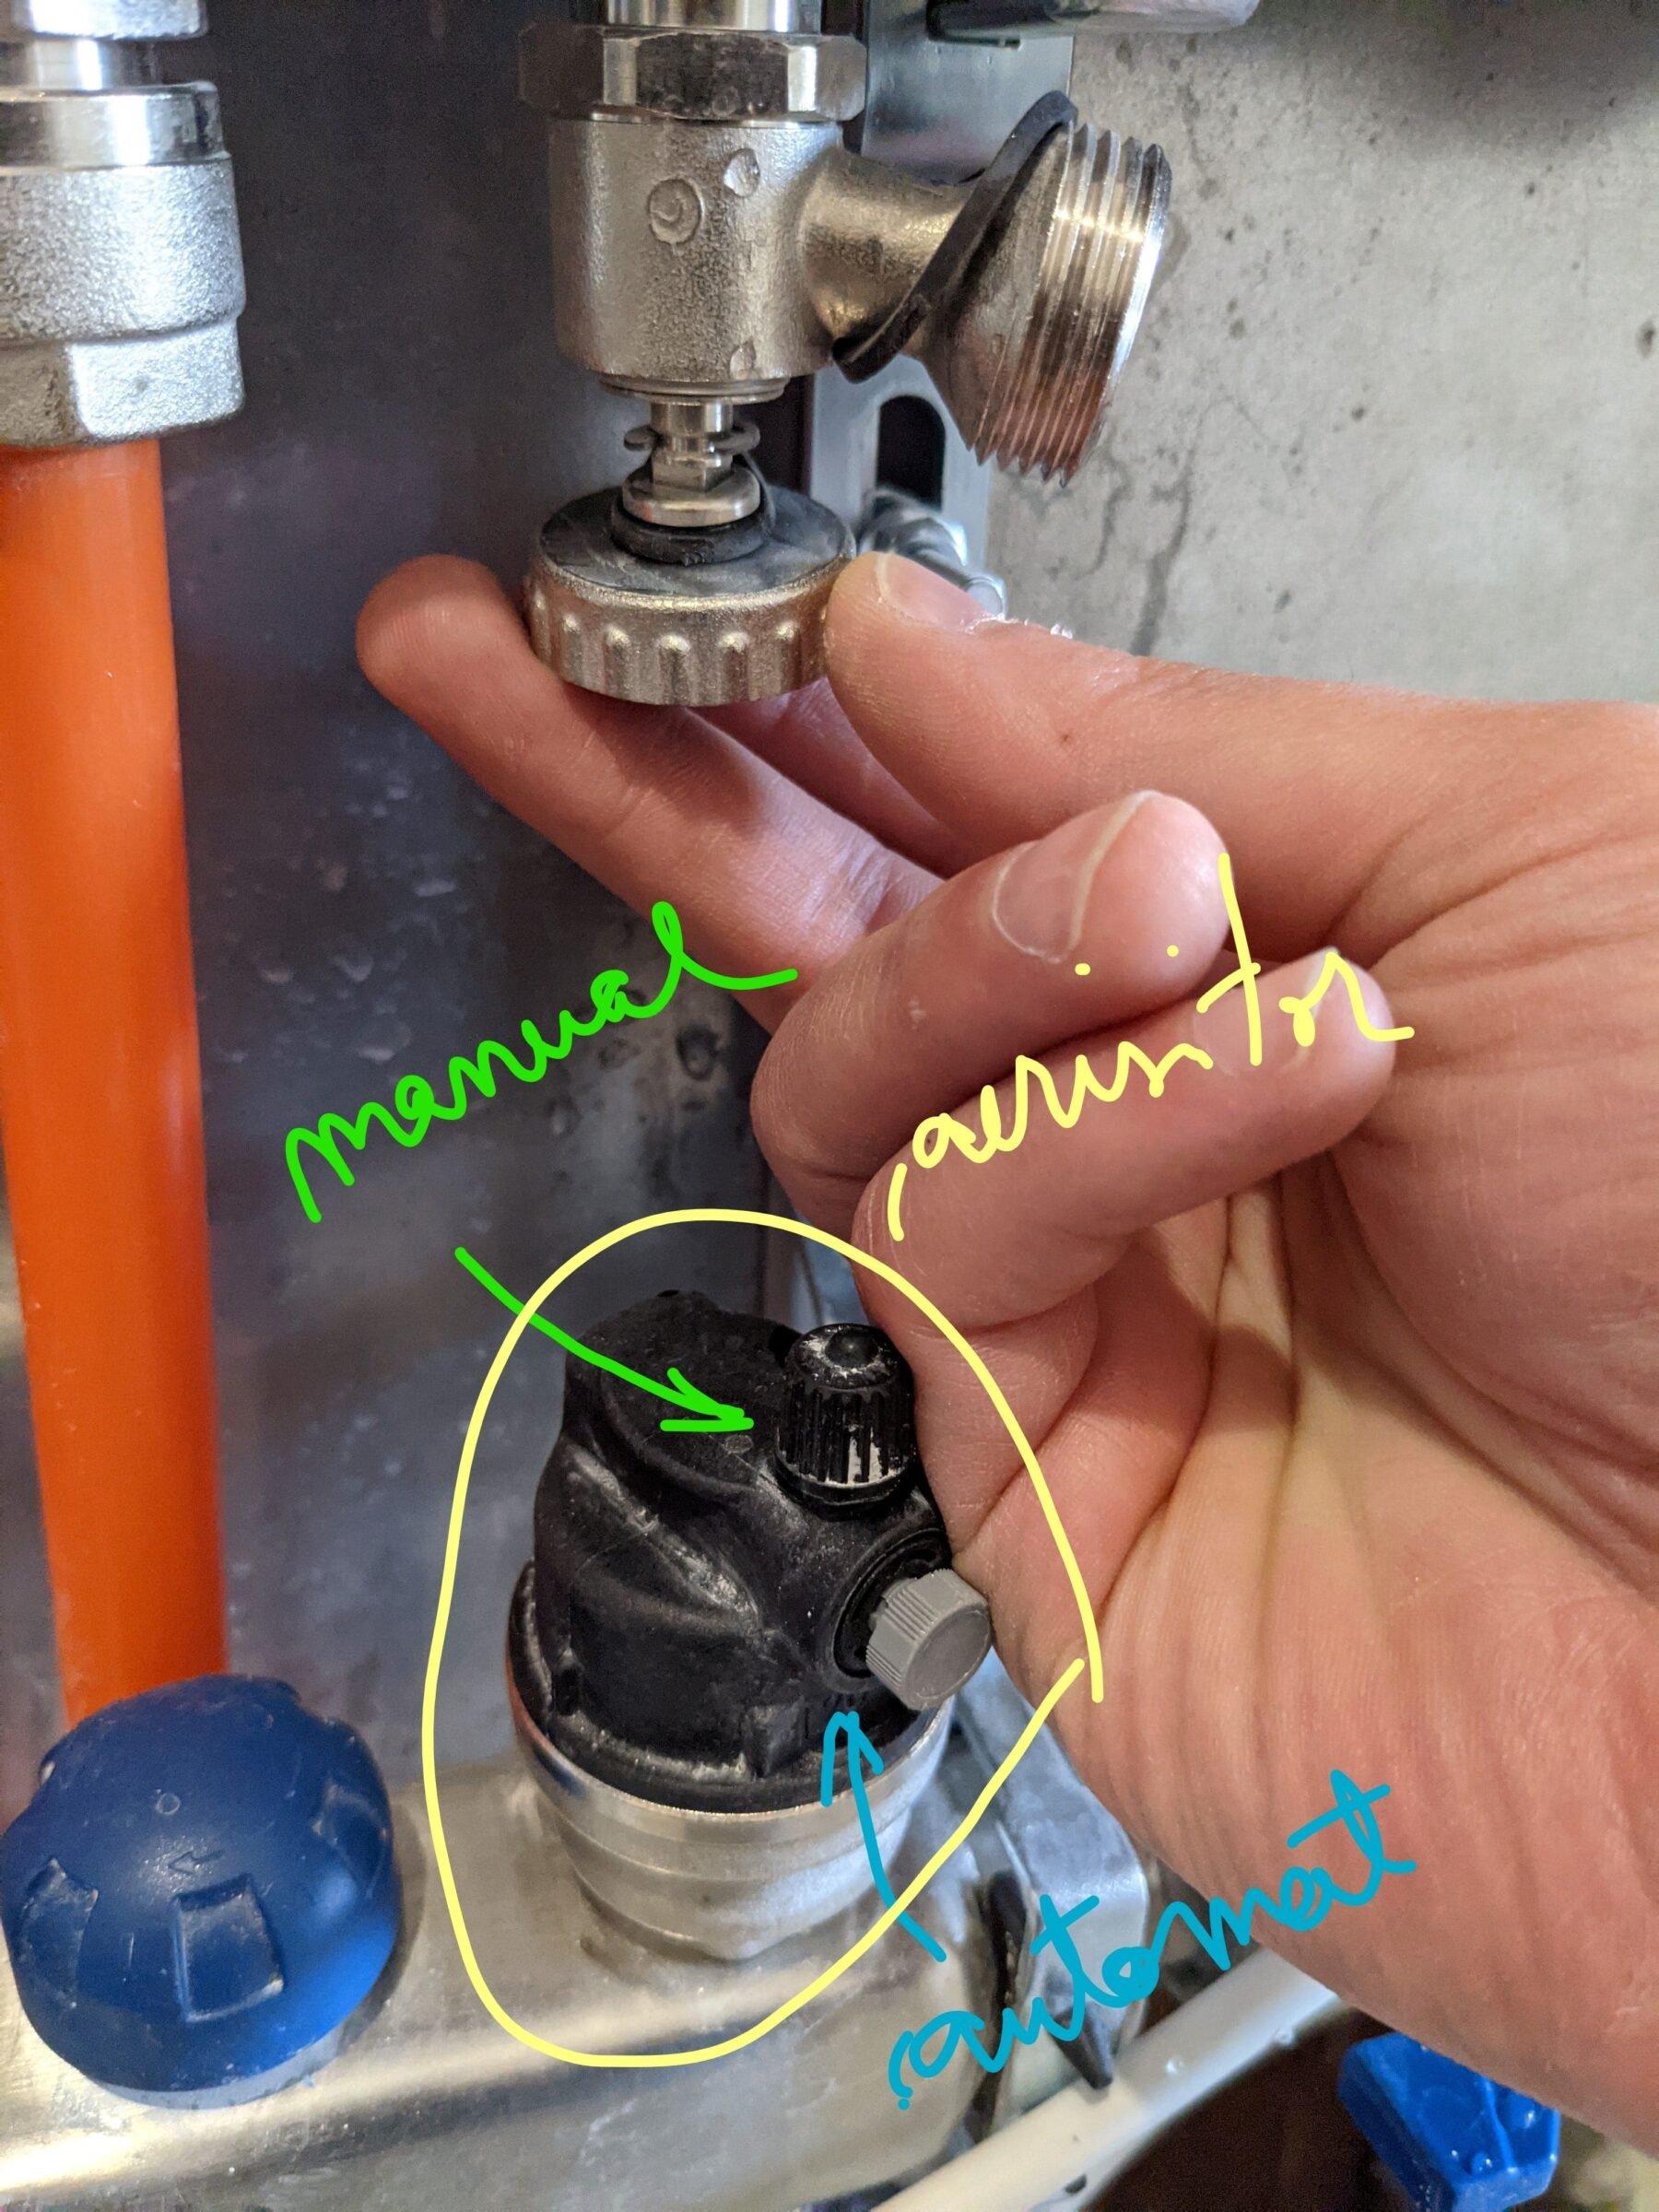 Aerisire incalzire in pardoseala - aerisitor manual automat